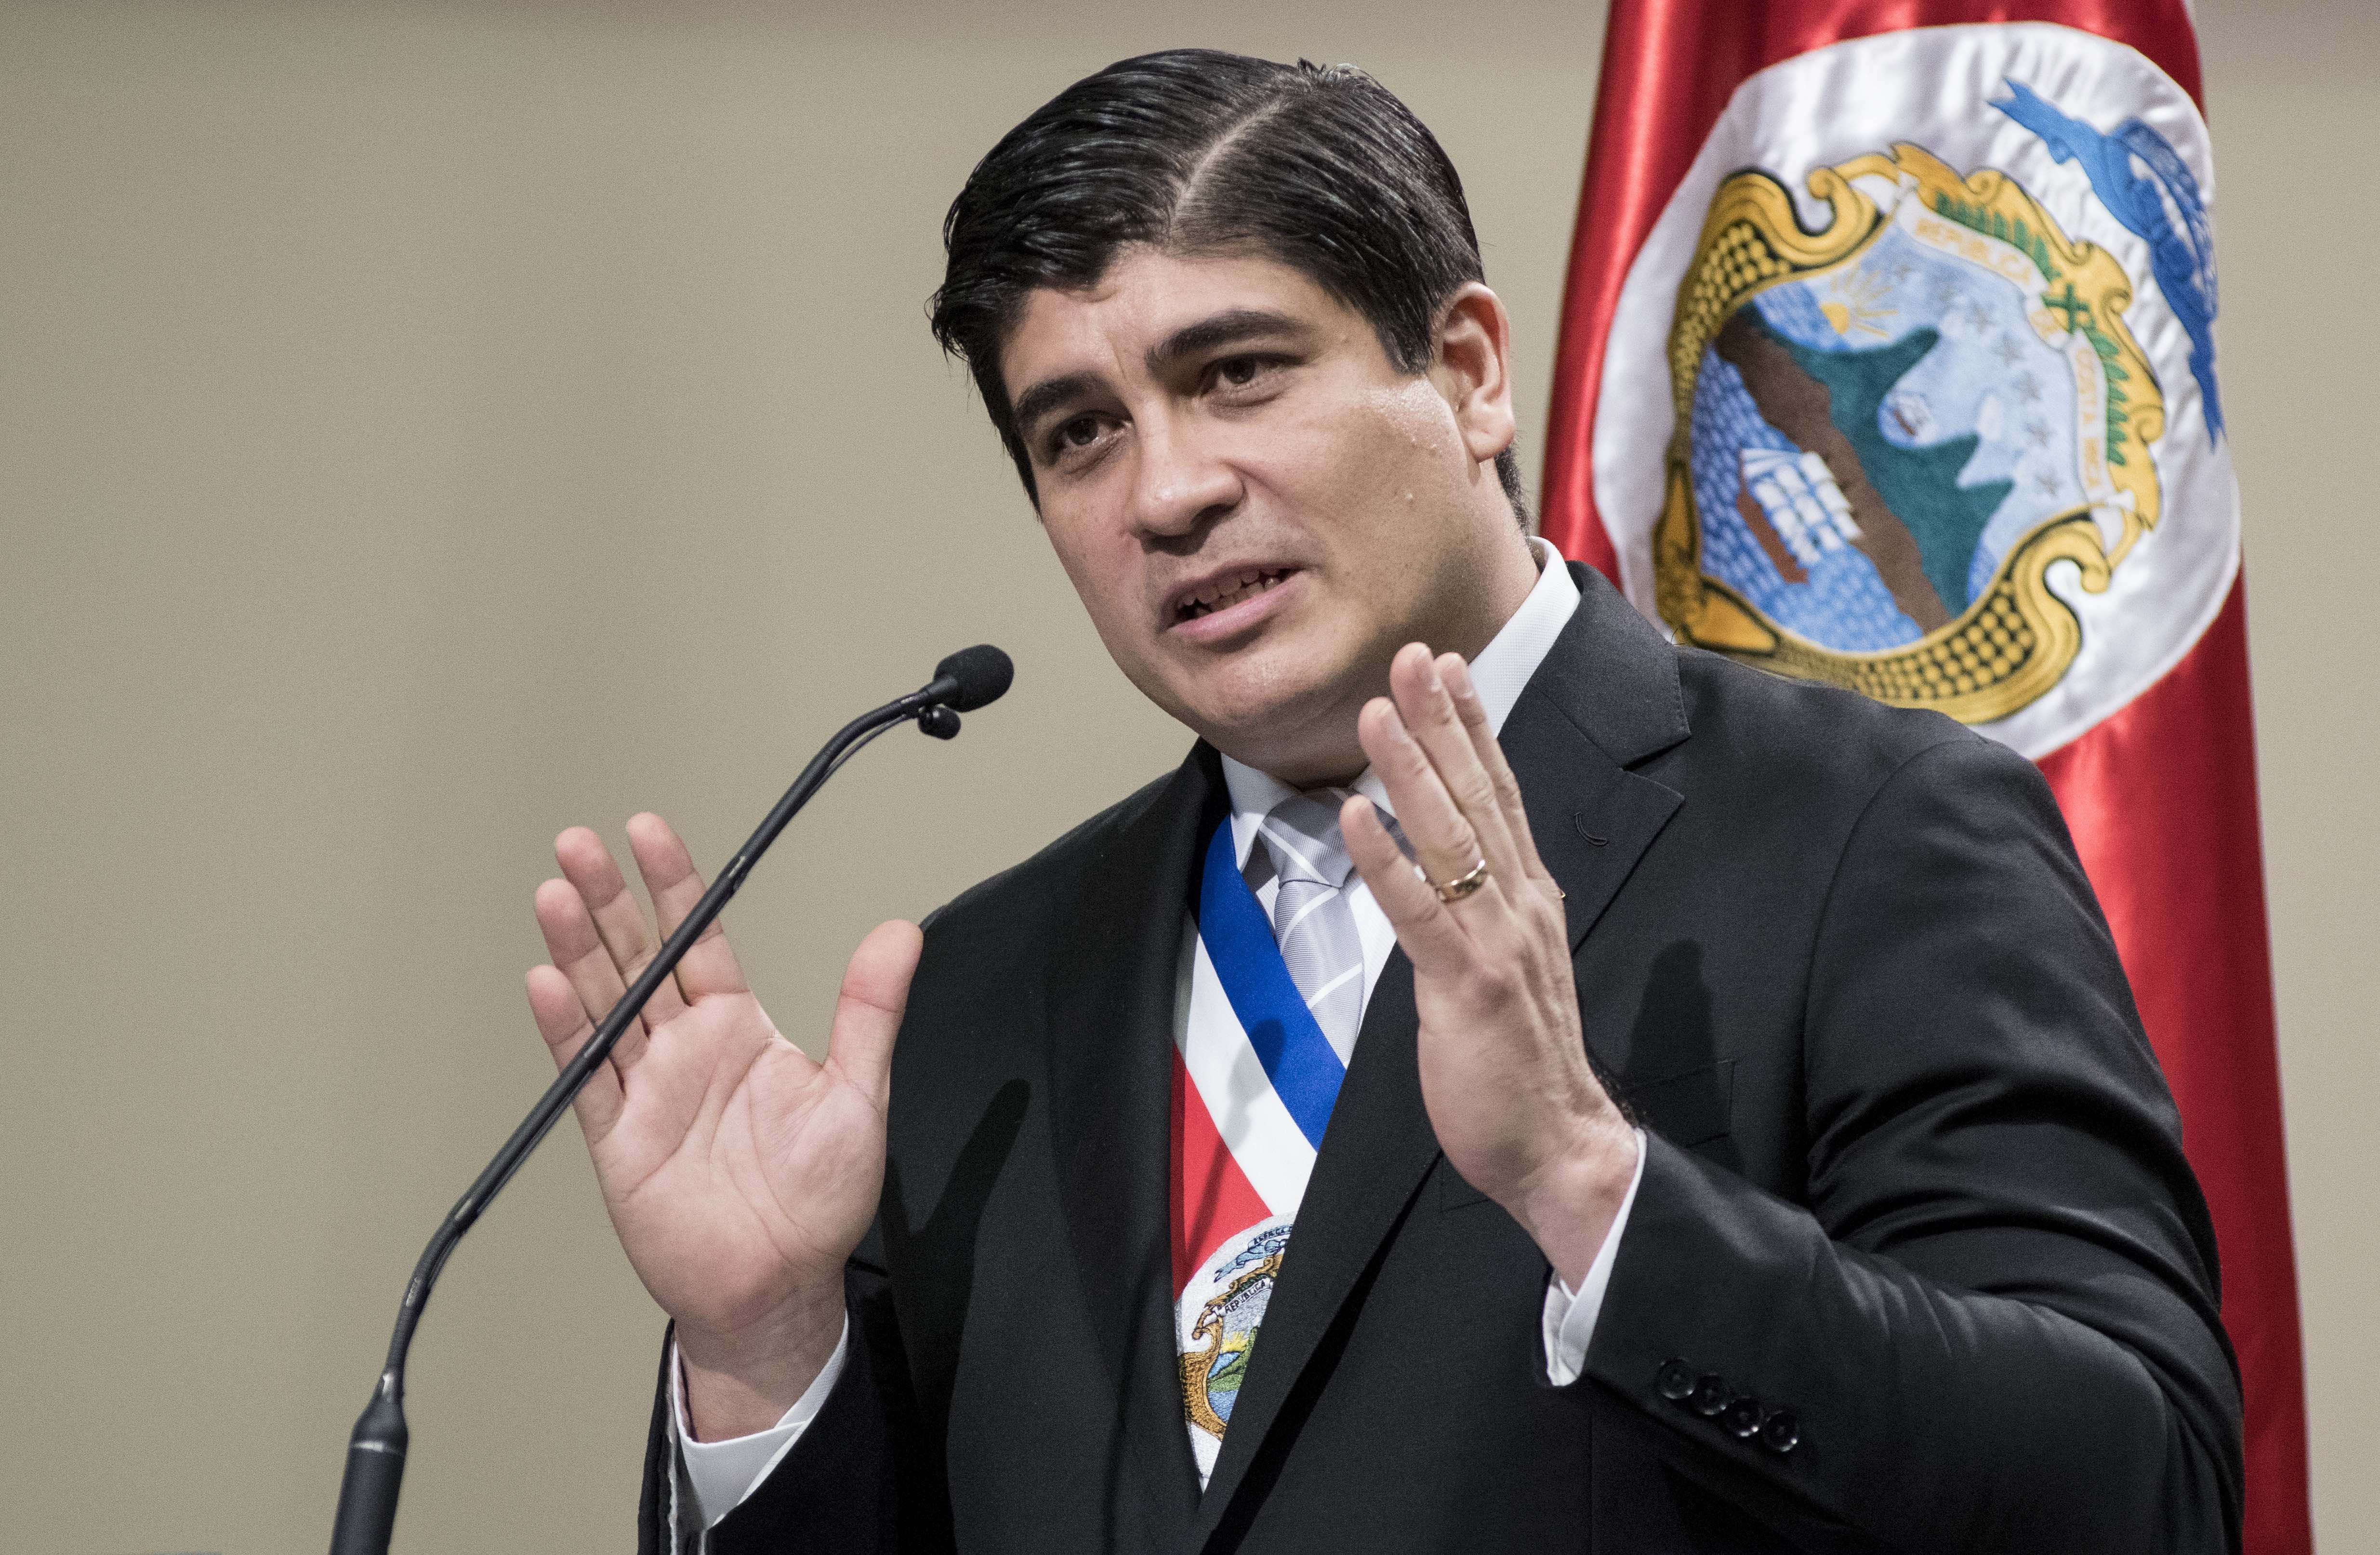 Costa Rica President Carlos Alvarado